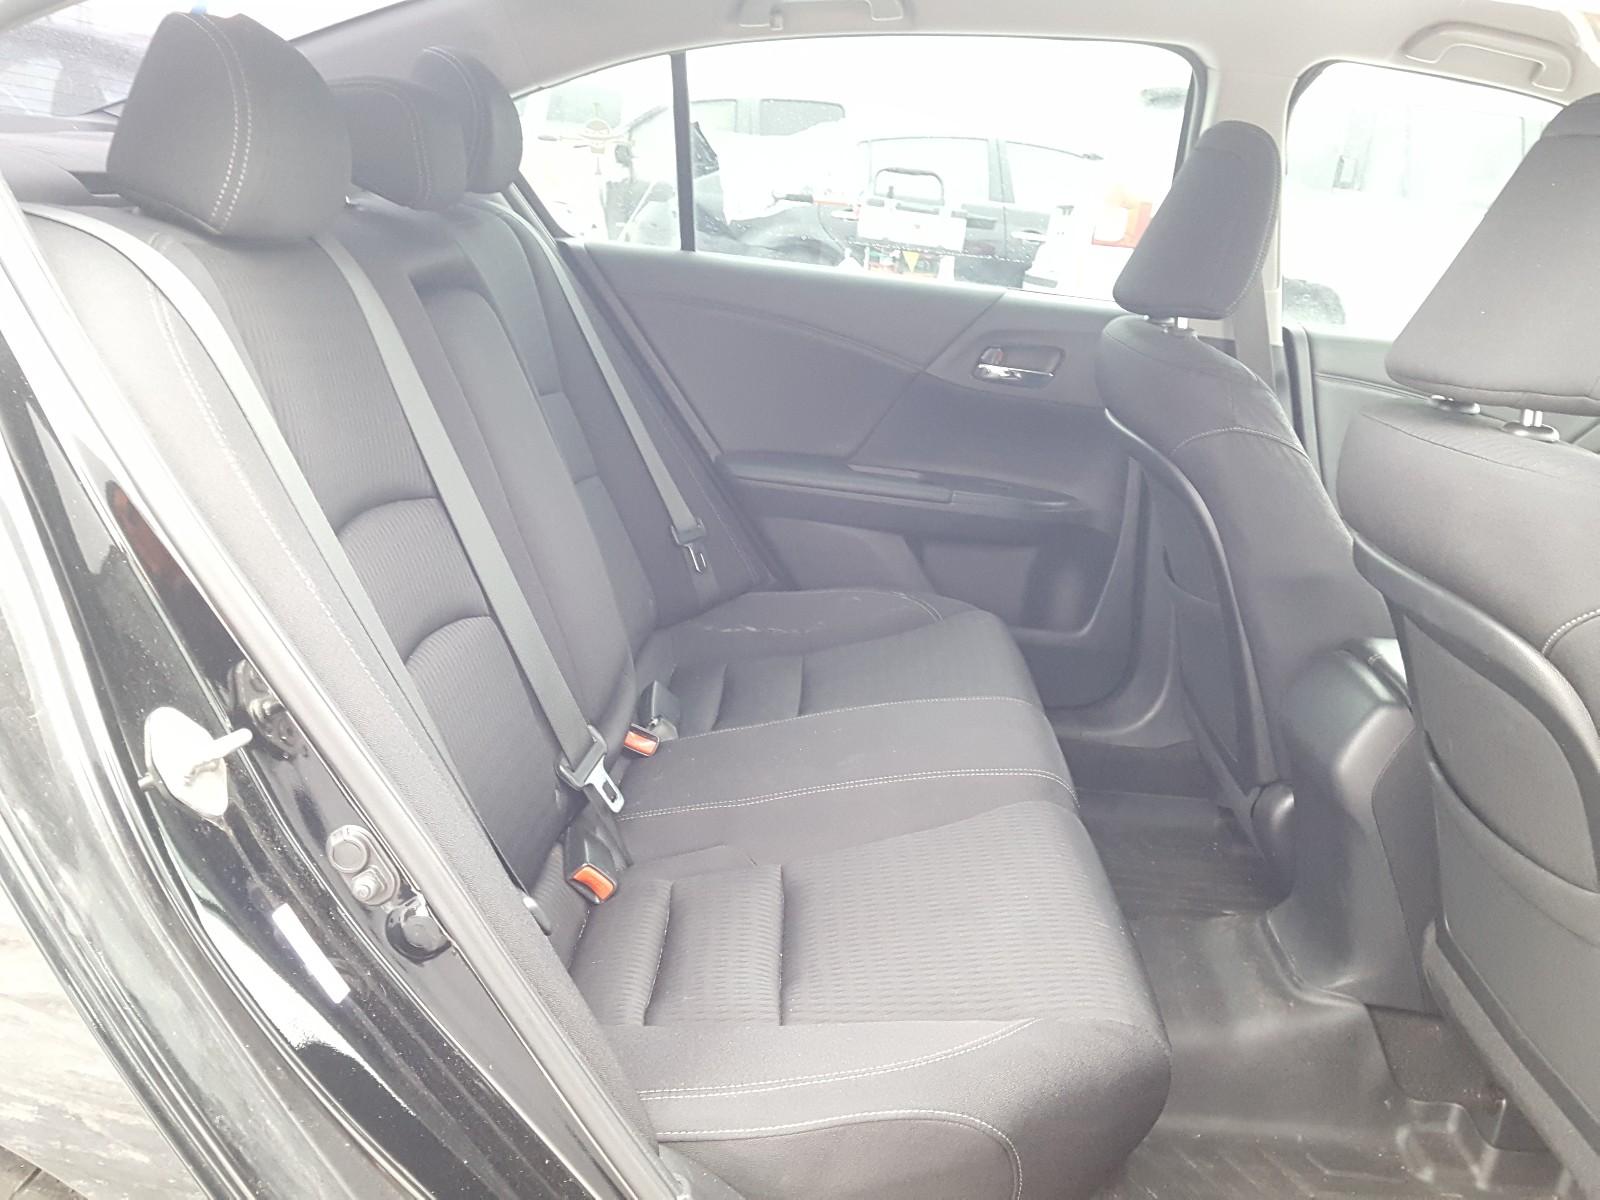 1HGCR2F5XEA126161 - 2014 Honda Accord Spo 2.4L detail view